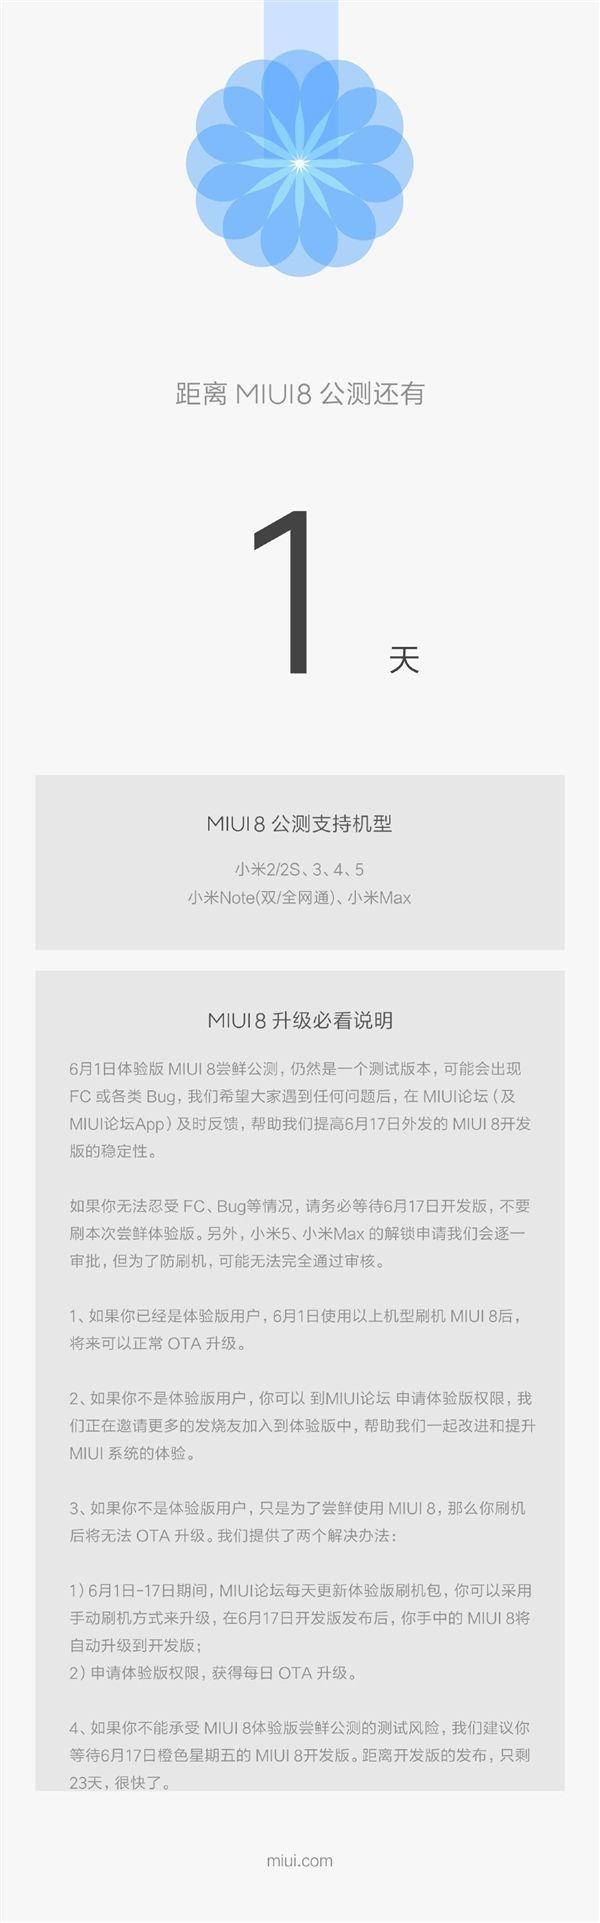 MIUI 8 в качестве официального бета-тестирования станет доступна для Xiaomi Mi2, Mi2S, Mi3, Mi4, Mi Note, Mi5 и Mi Max с 1 июня – фото 2